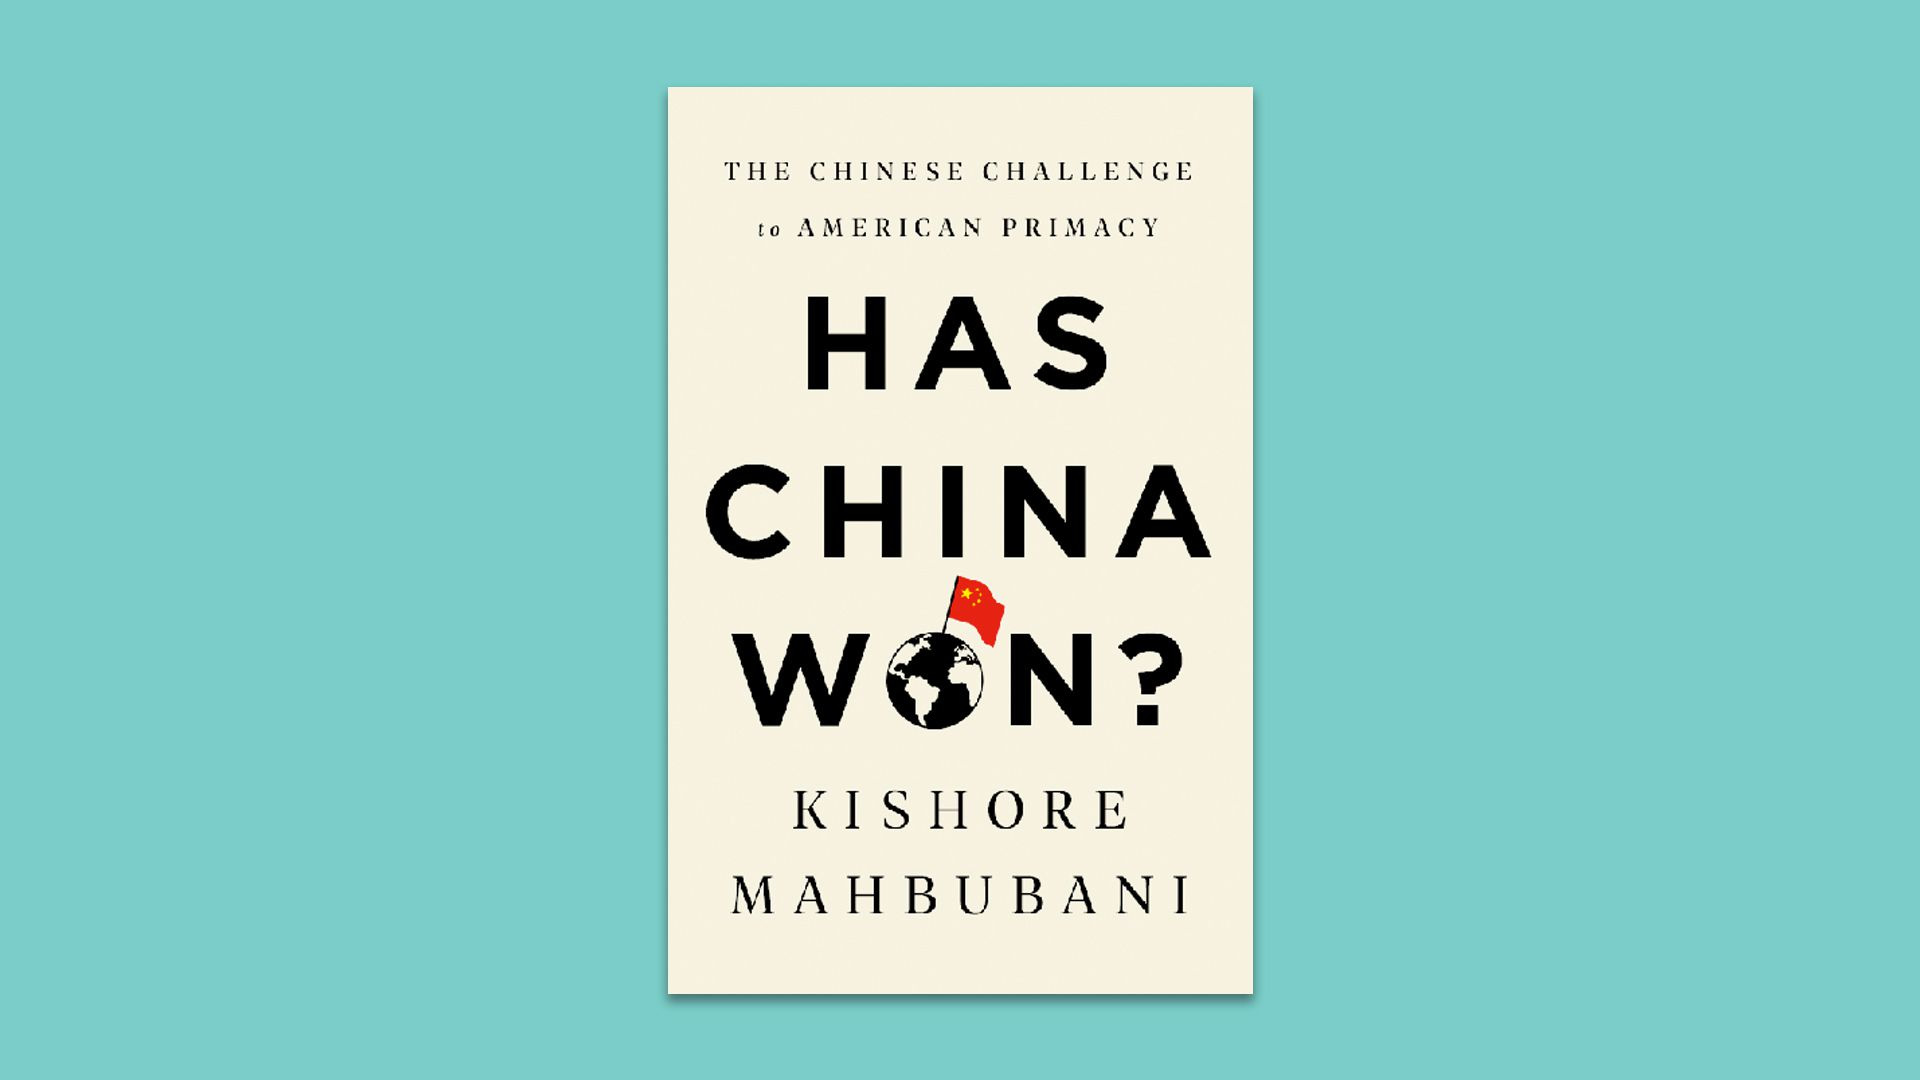 The cover of Kishore Mahbubani's book